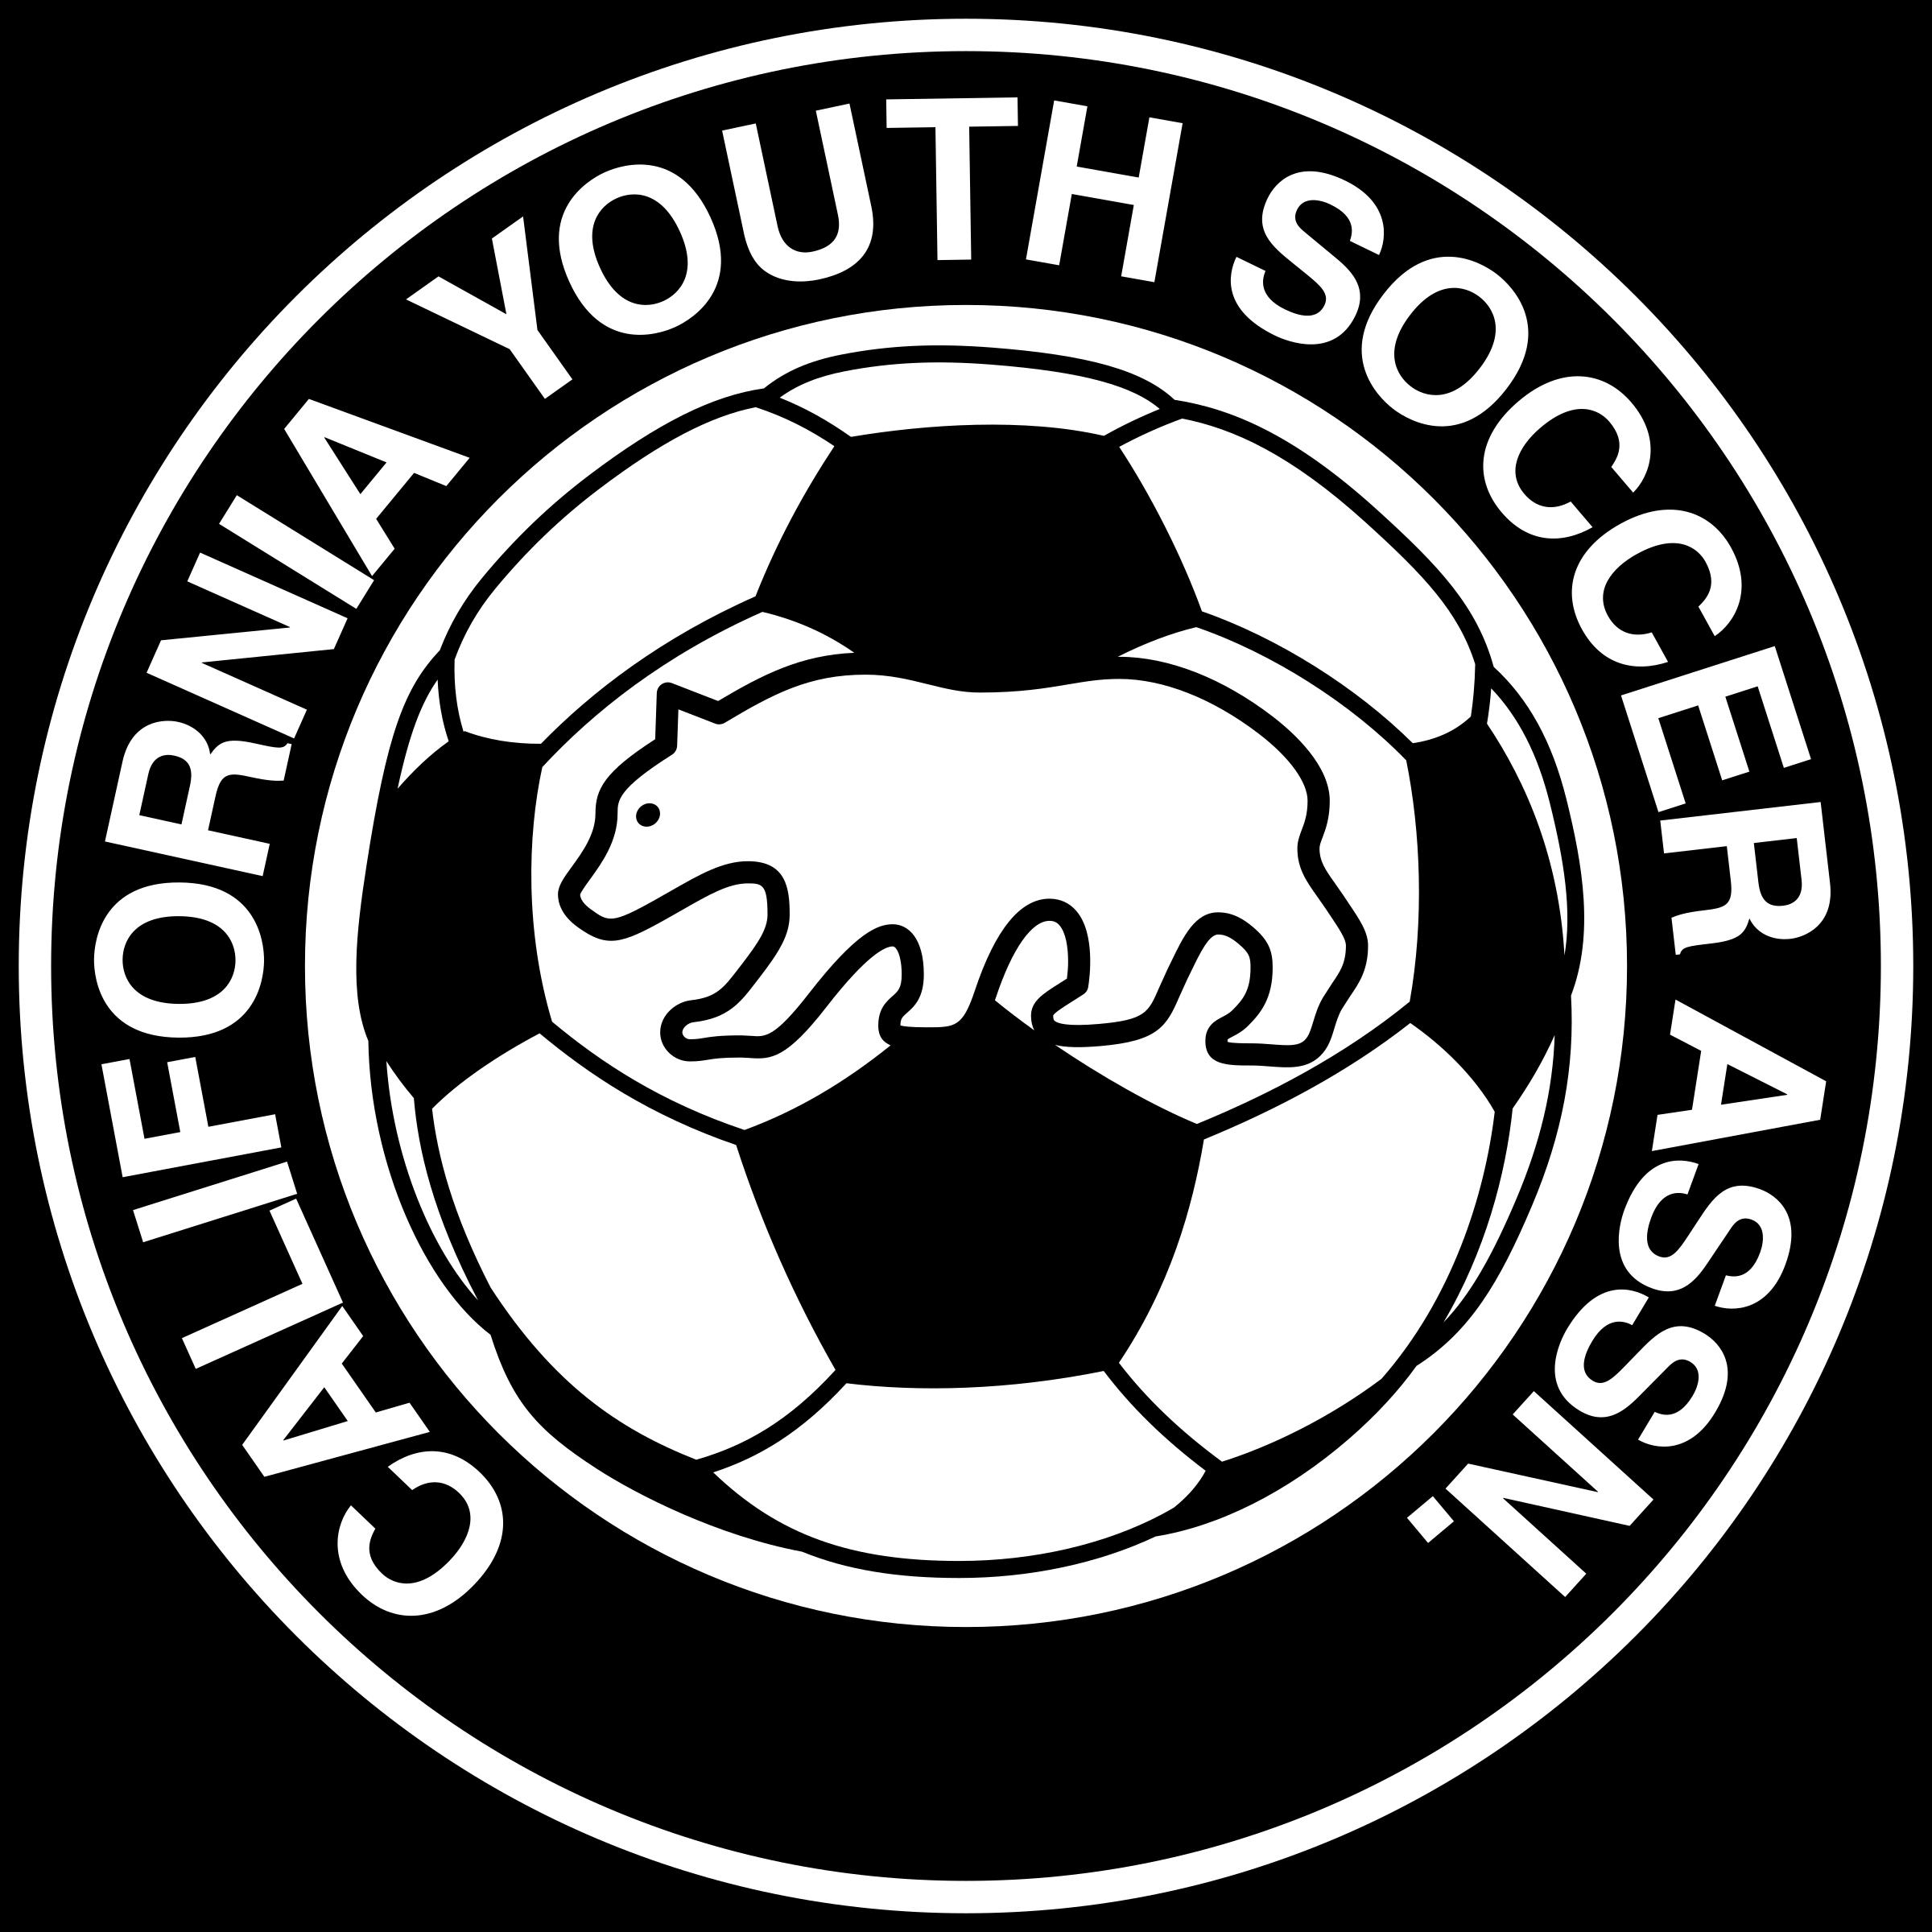 picture transparent California ysa logo png. Vector crest transparent